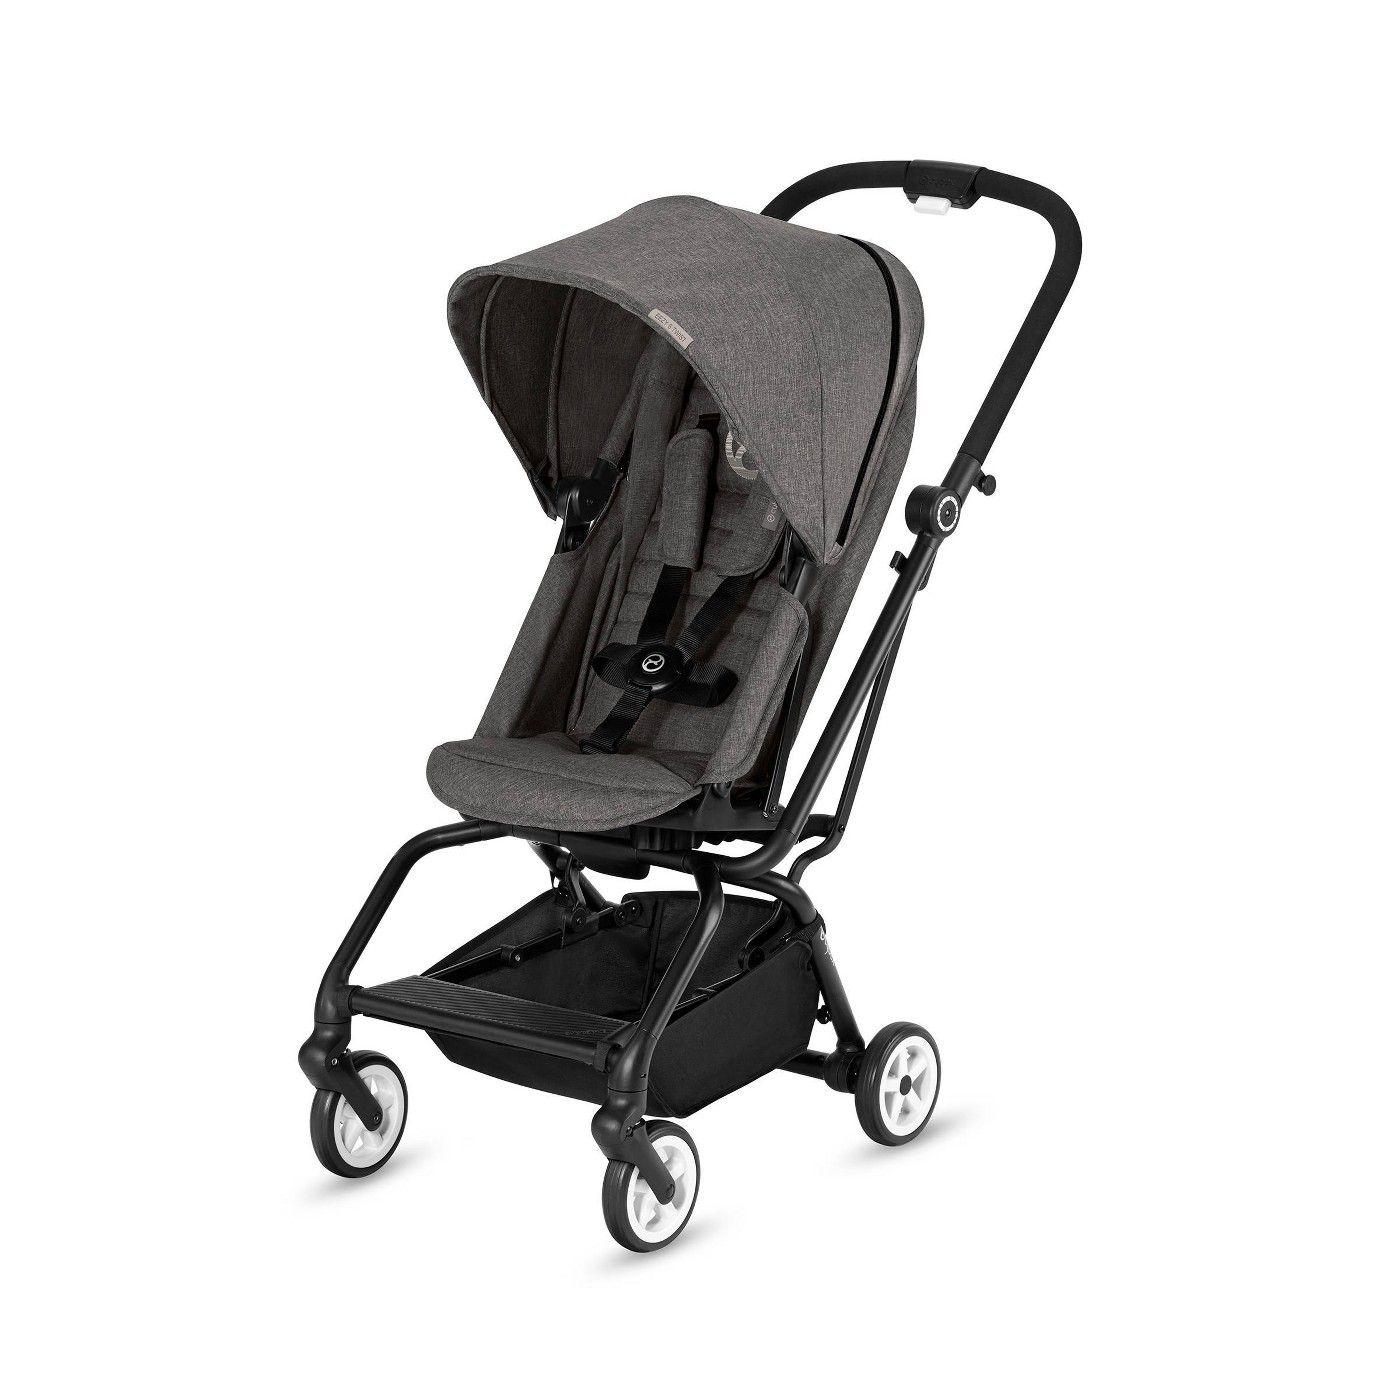 12+ Cybex stroller uk price ideas in 2021